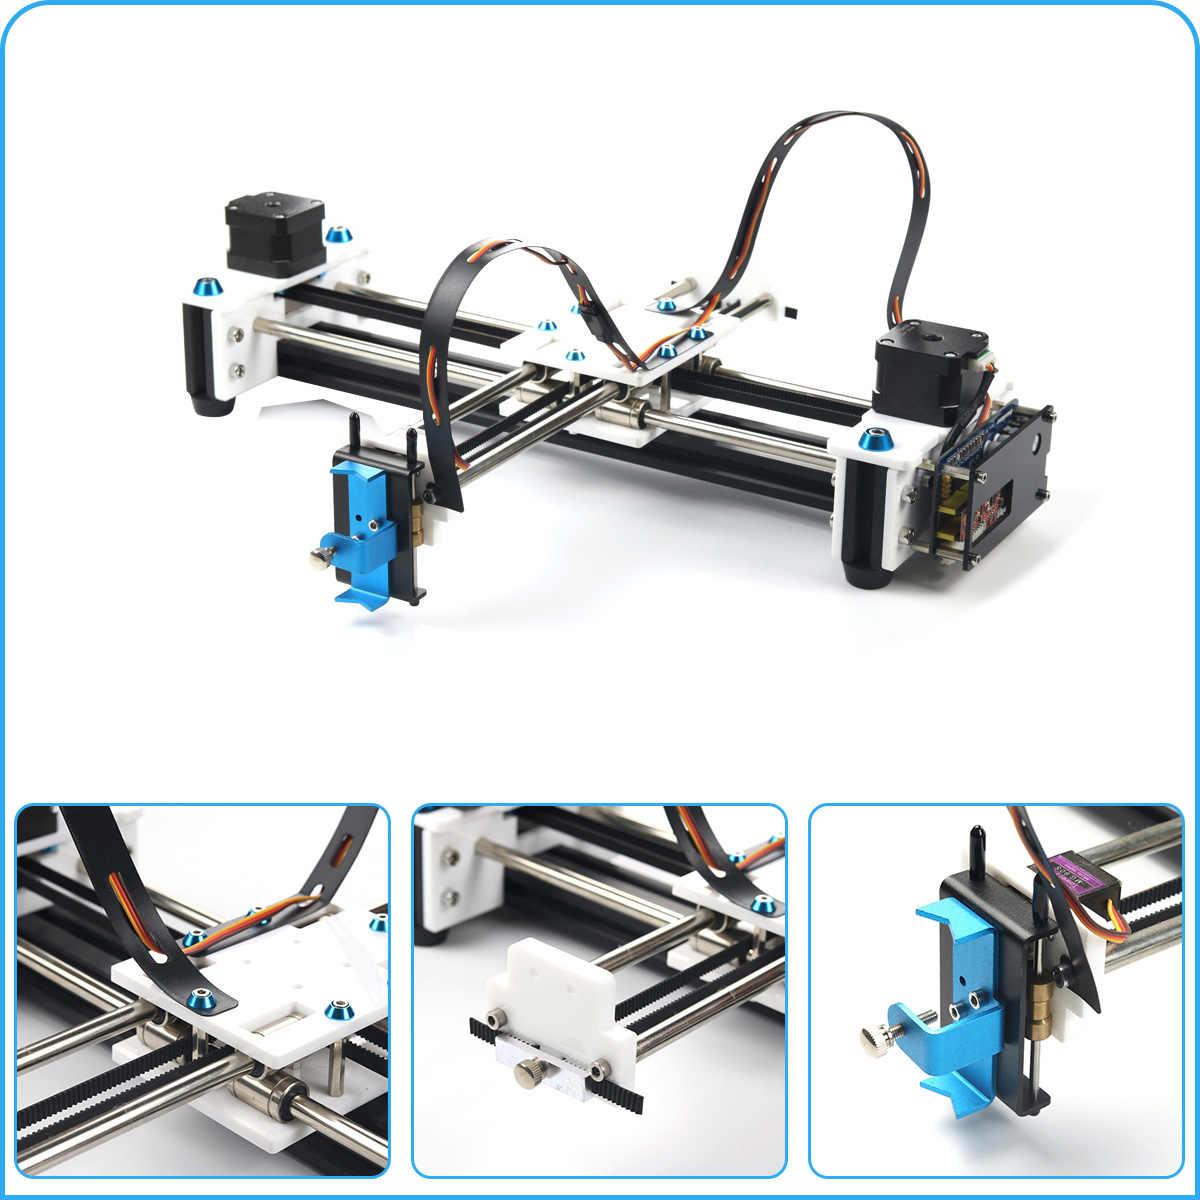 280x200 มม.มินิ XY 2 แกน CNC ปากกา USB เลเซอร์ DIY เครื่องวาดพื้นที่แกะสลัก Desktop Drawing หุ่นยนต์